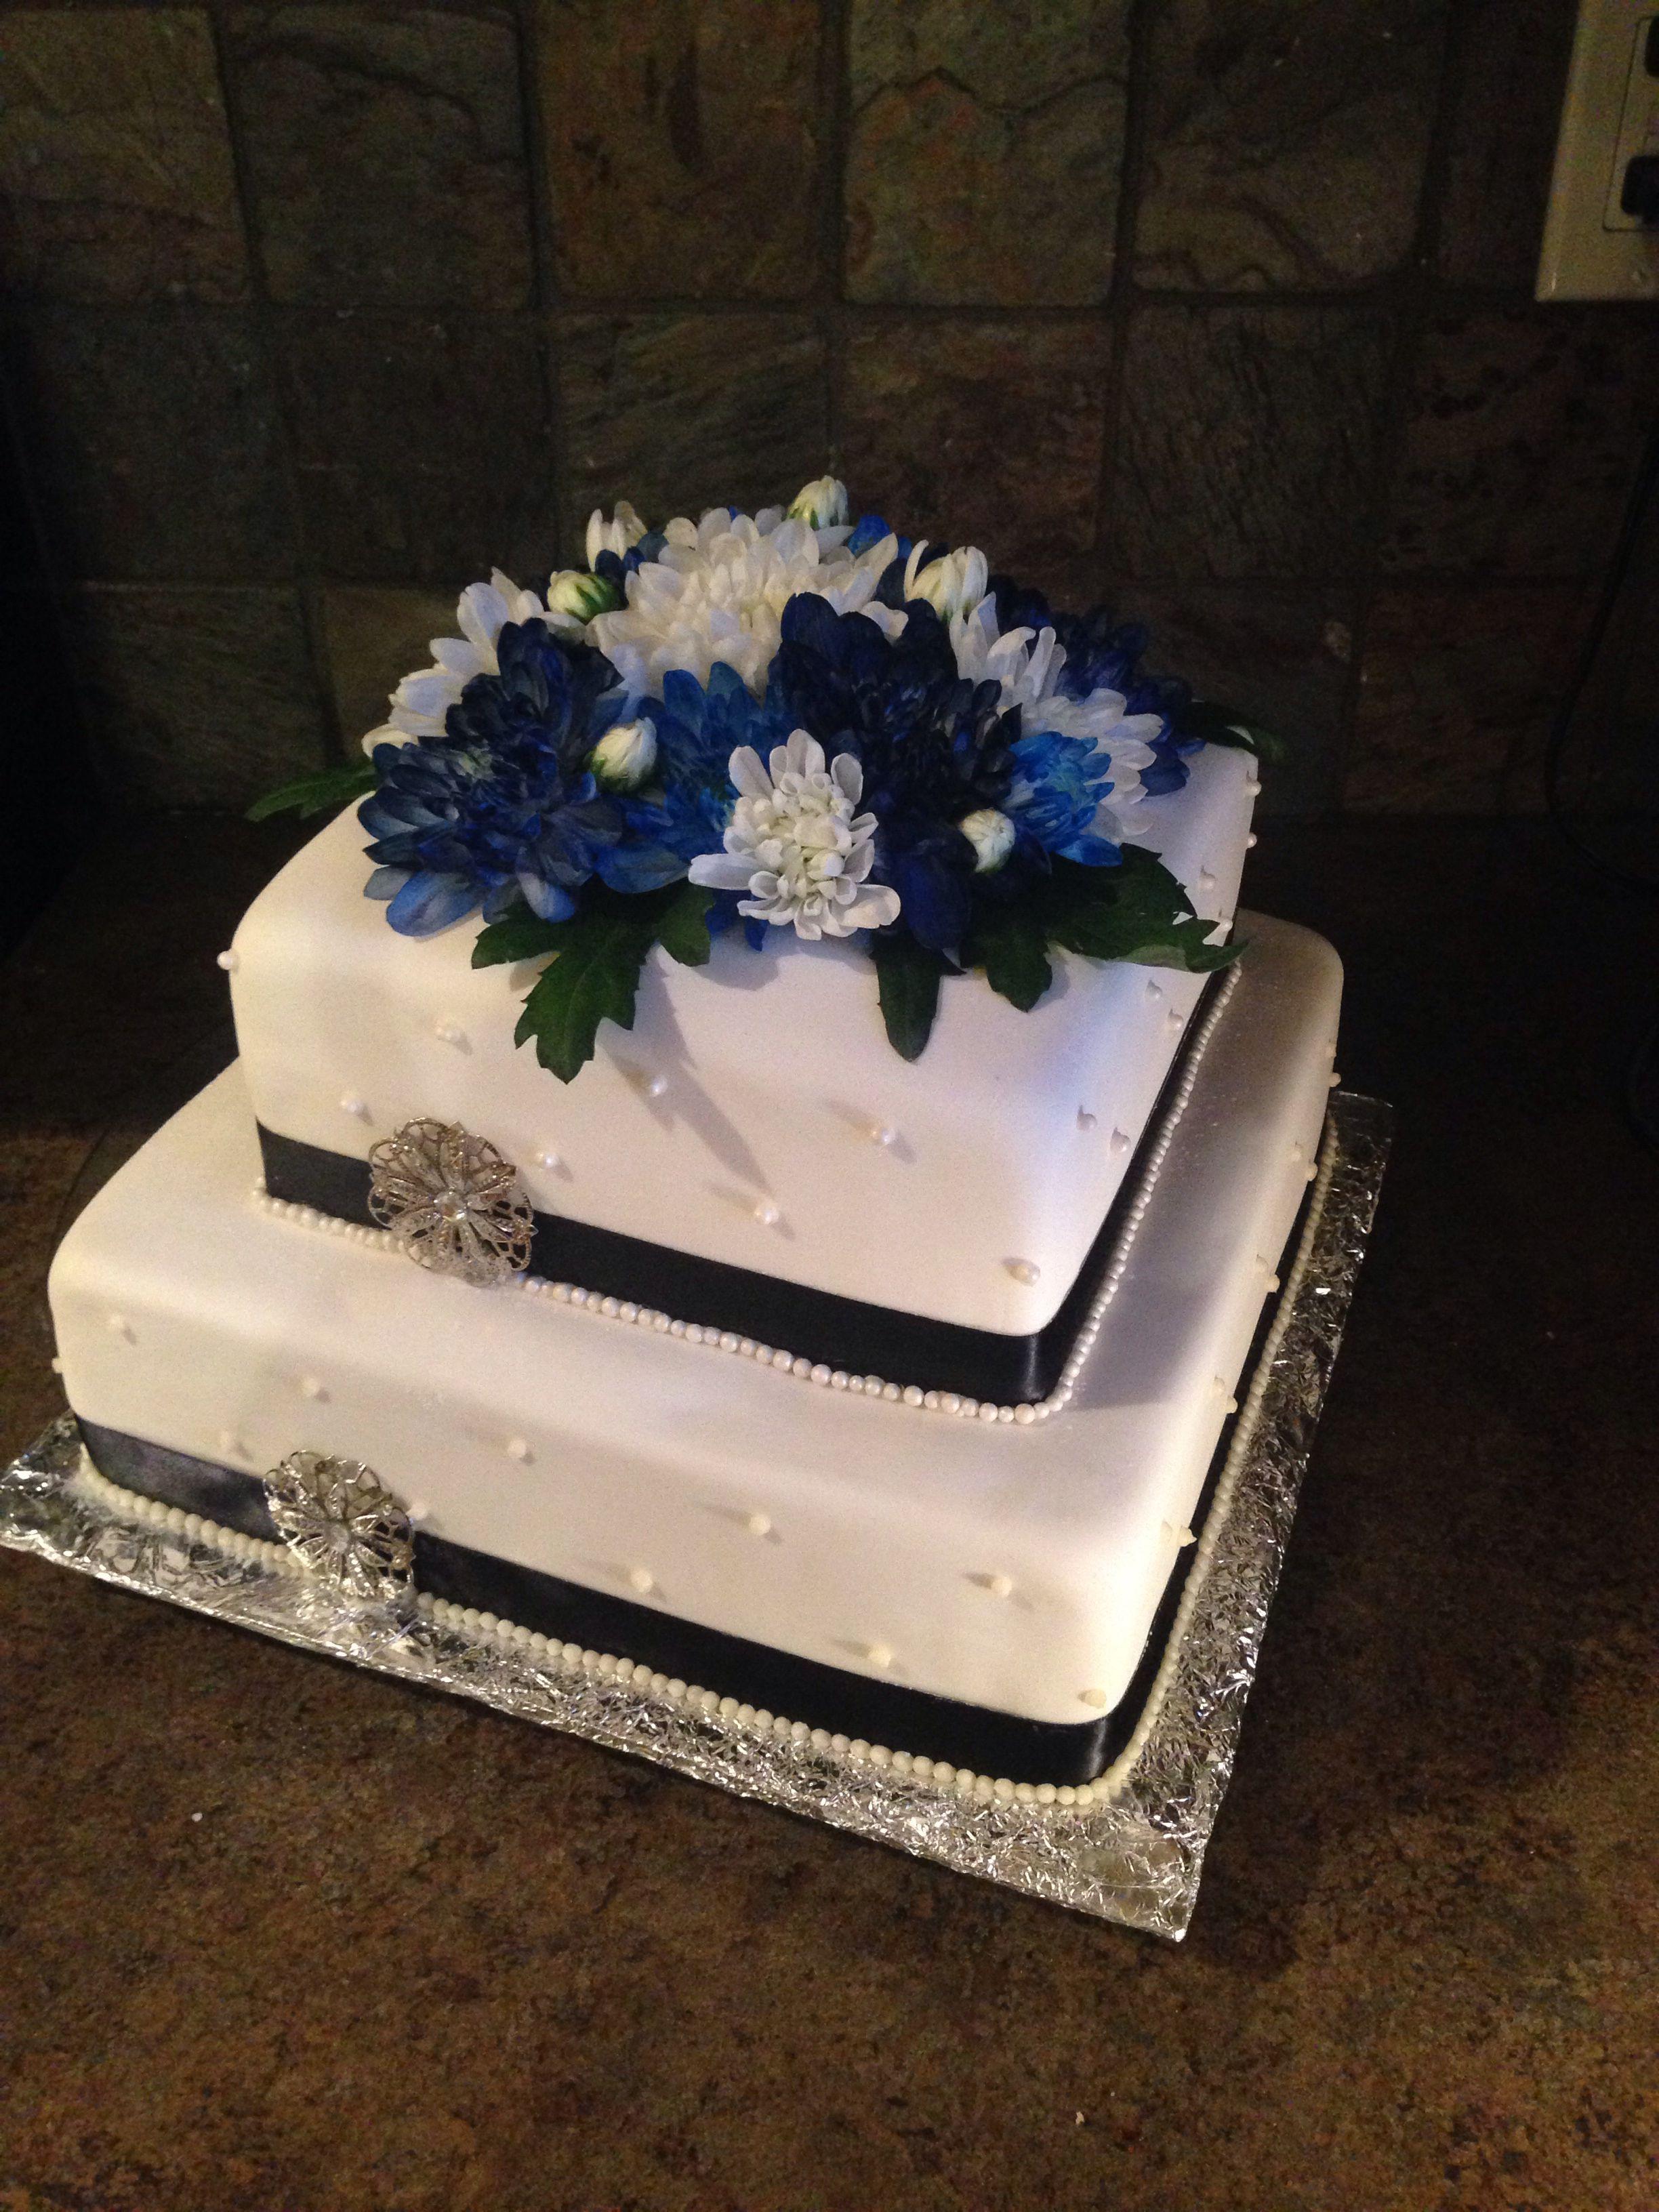 Square tiered wedding cake with blue mums birthday cake